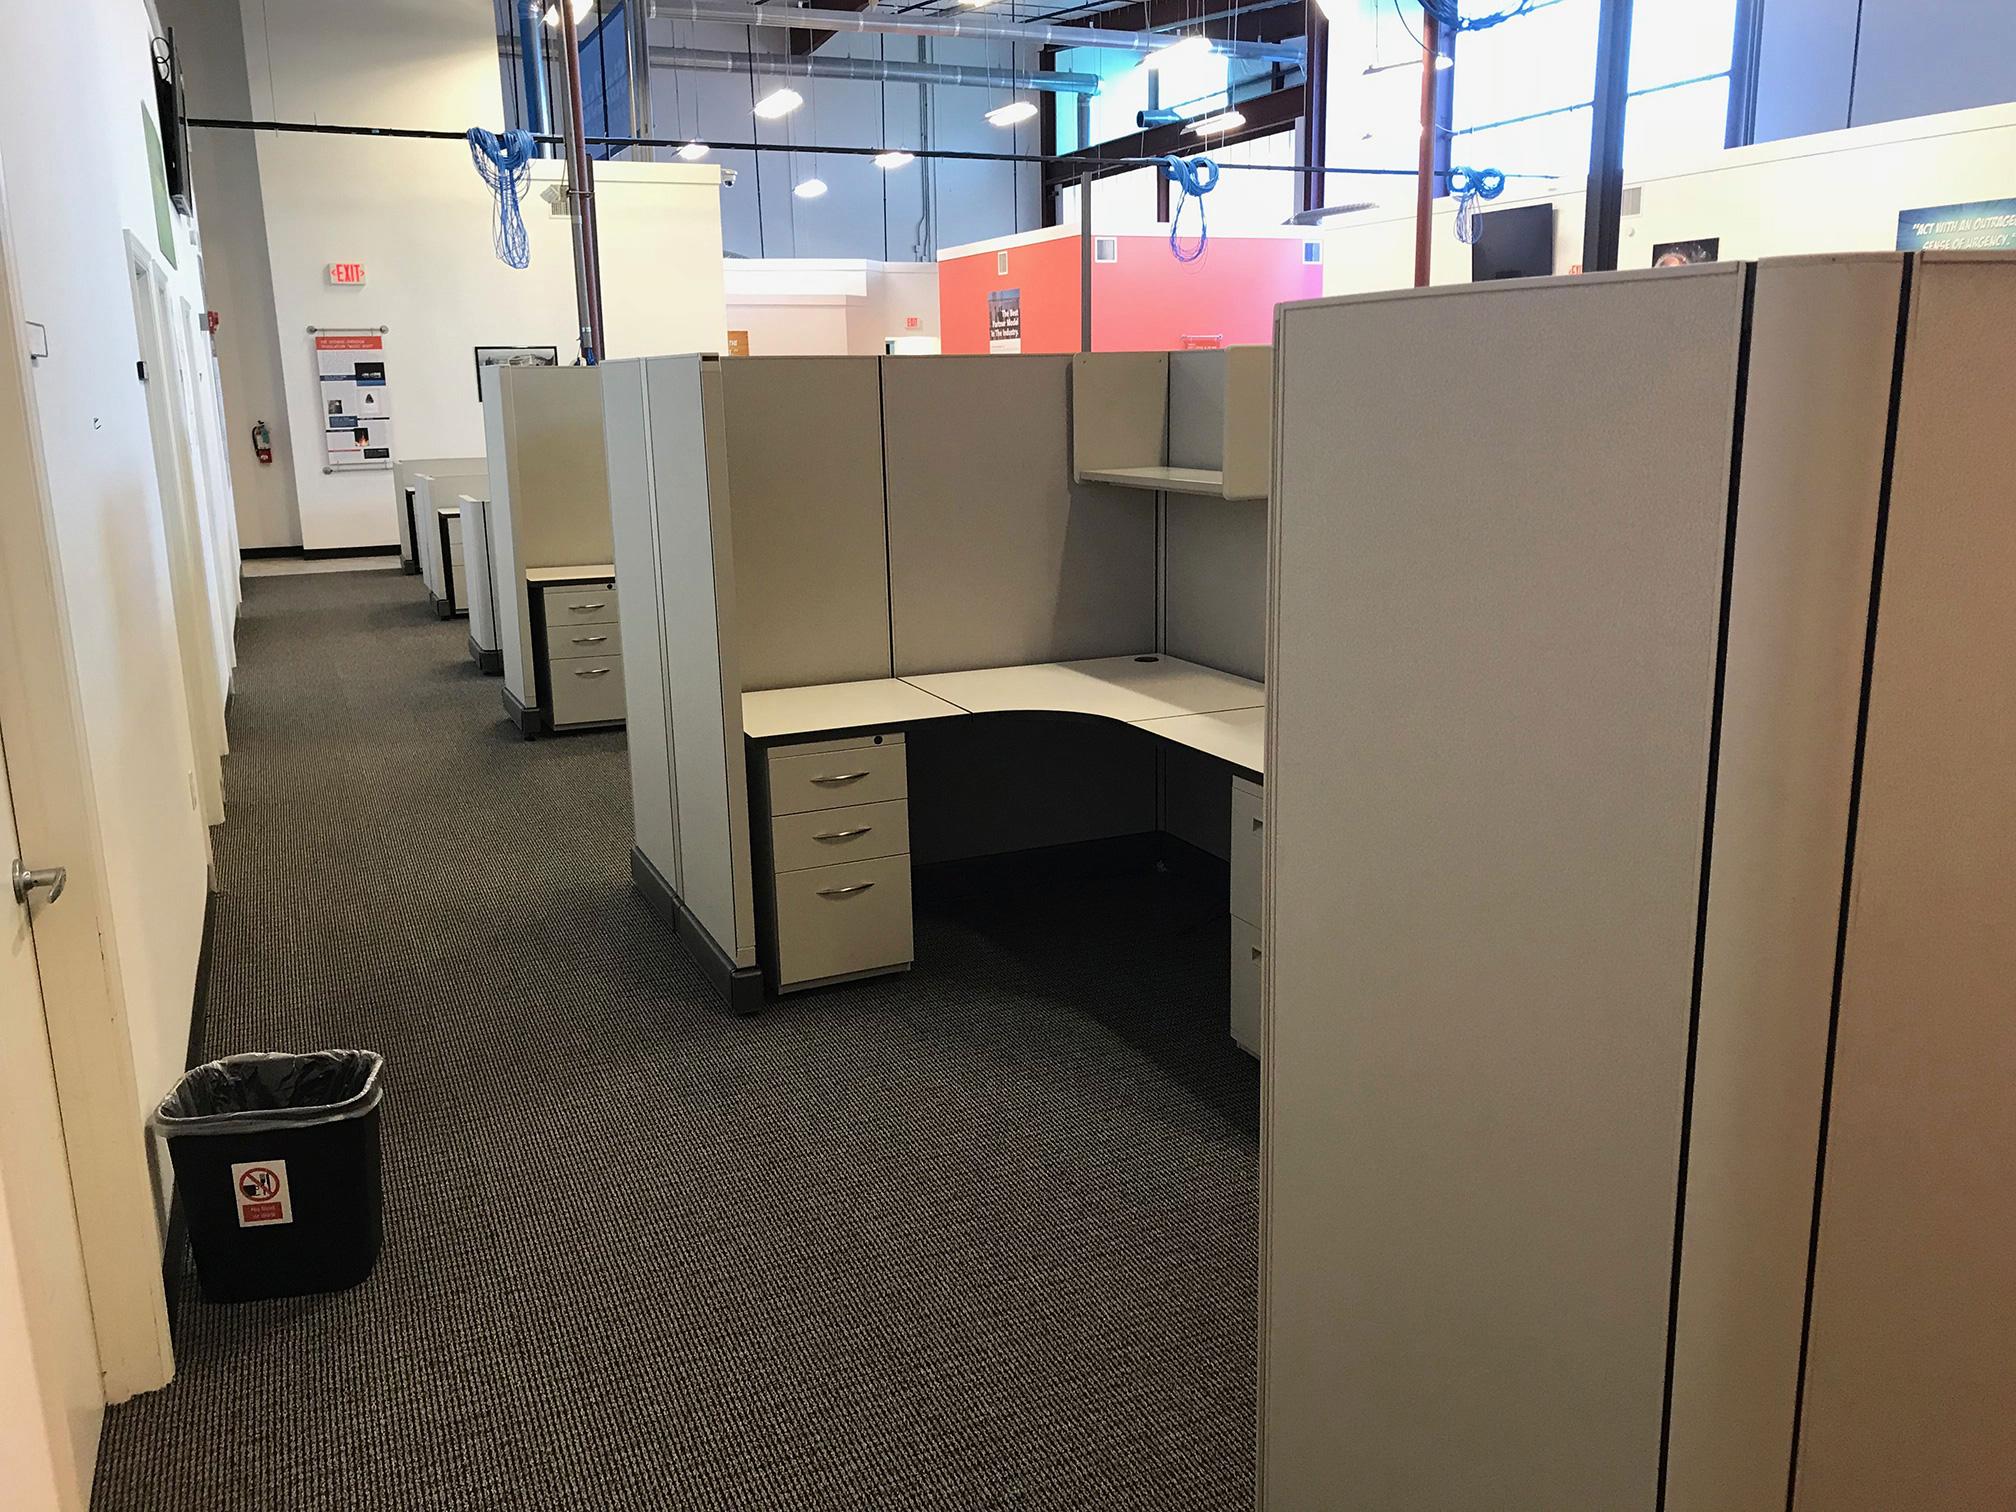 office-cubicles-for-sale-in-eustis-florida-3-1.jpg